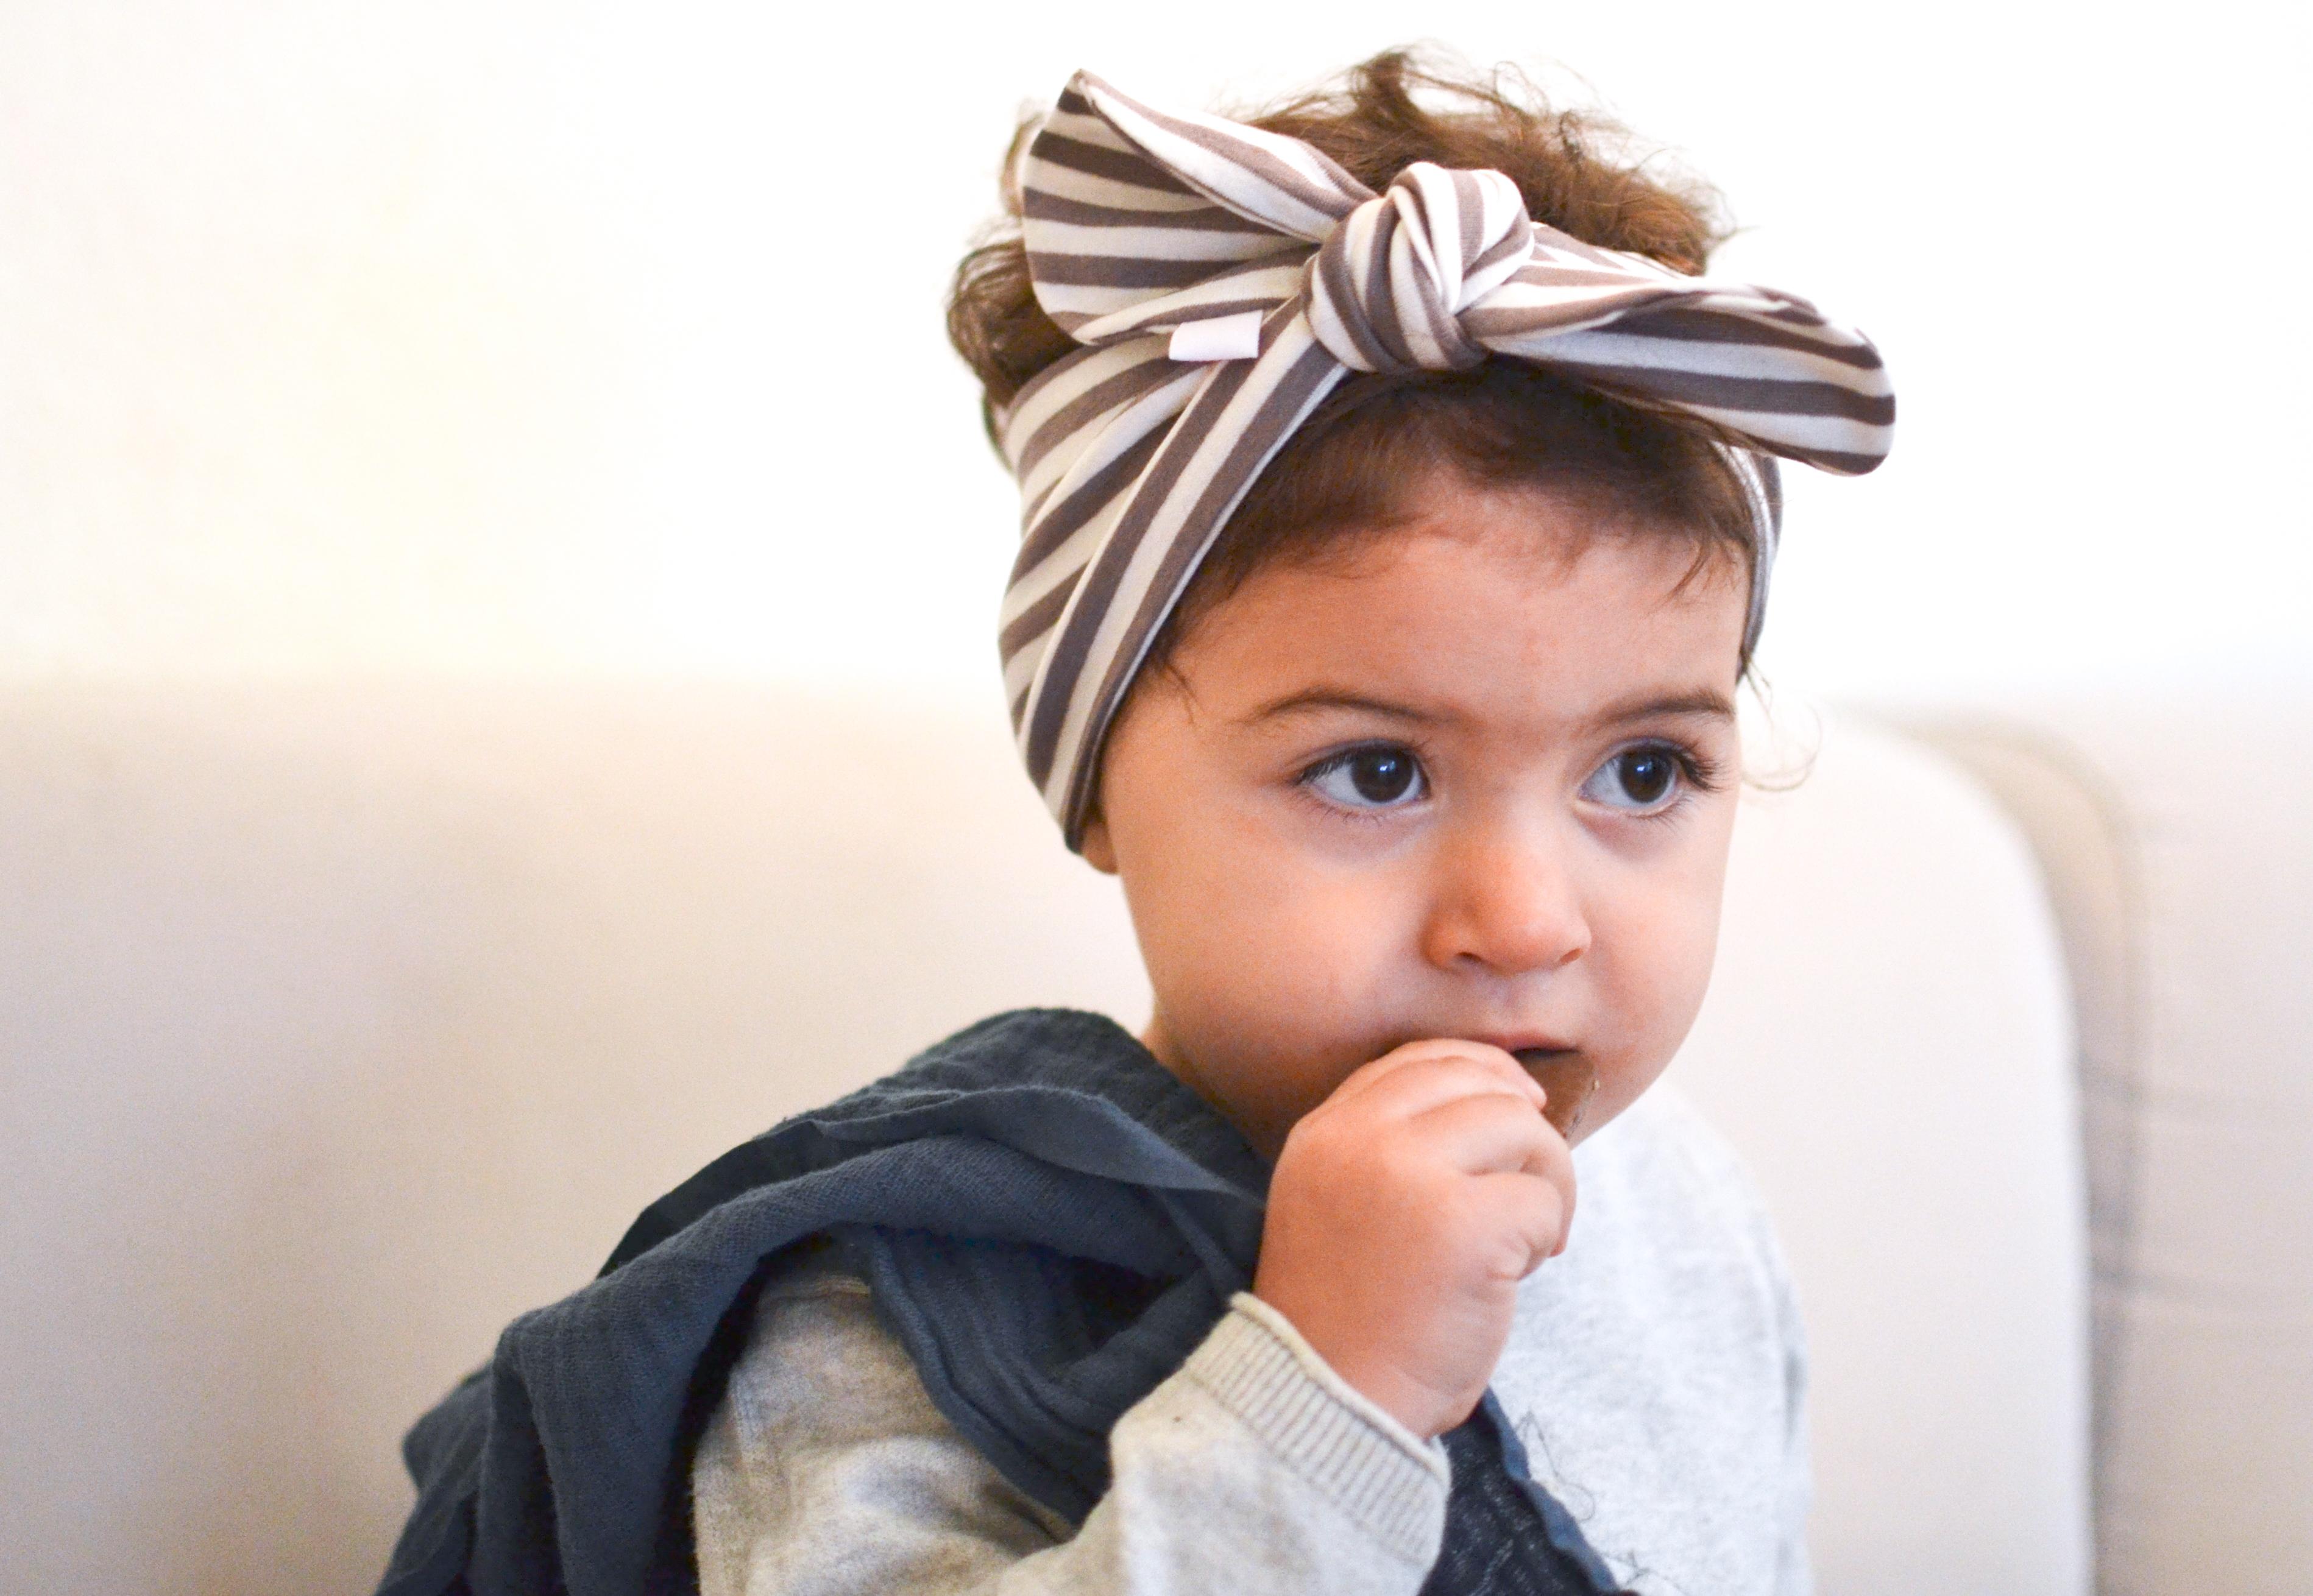 Cute baby & kids headscarf or headband